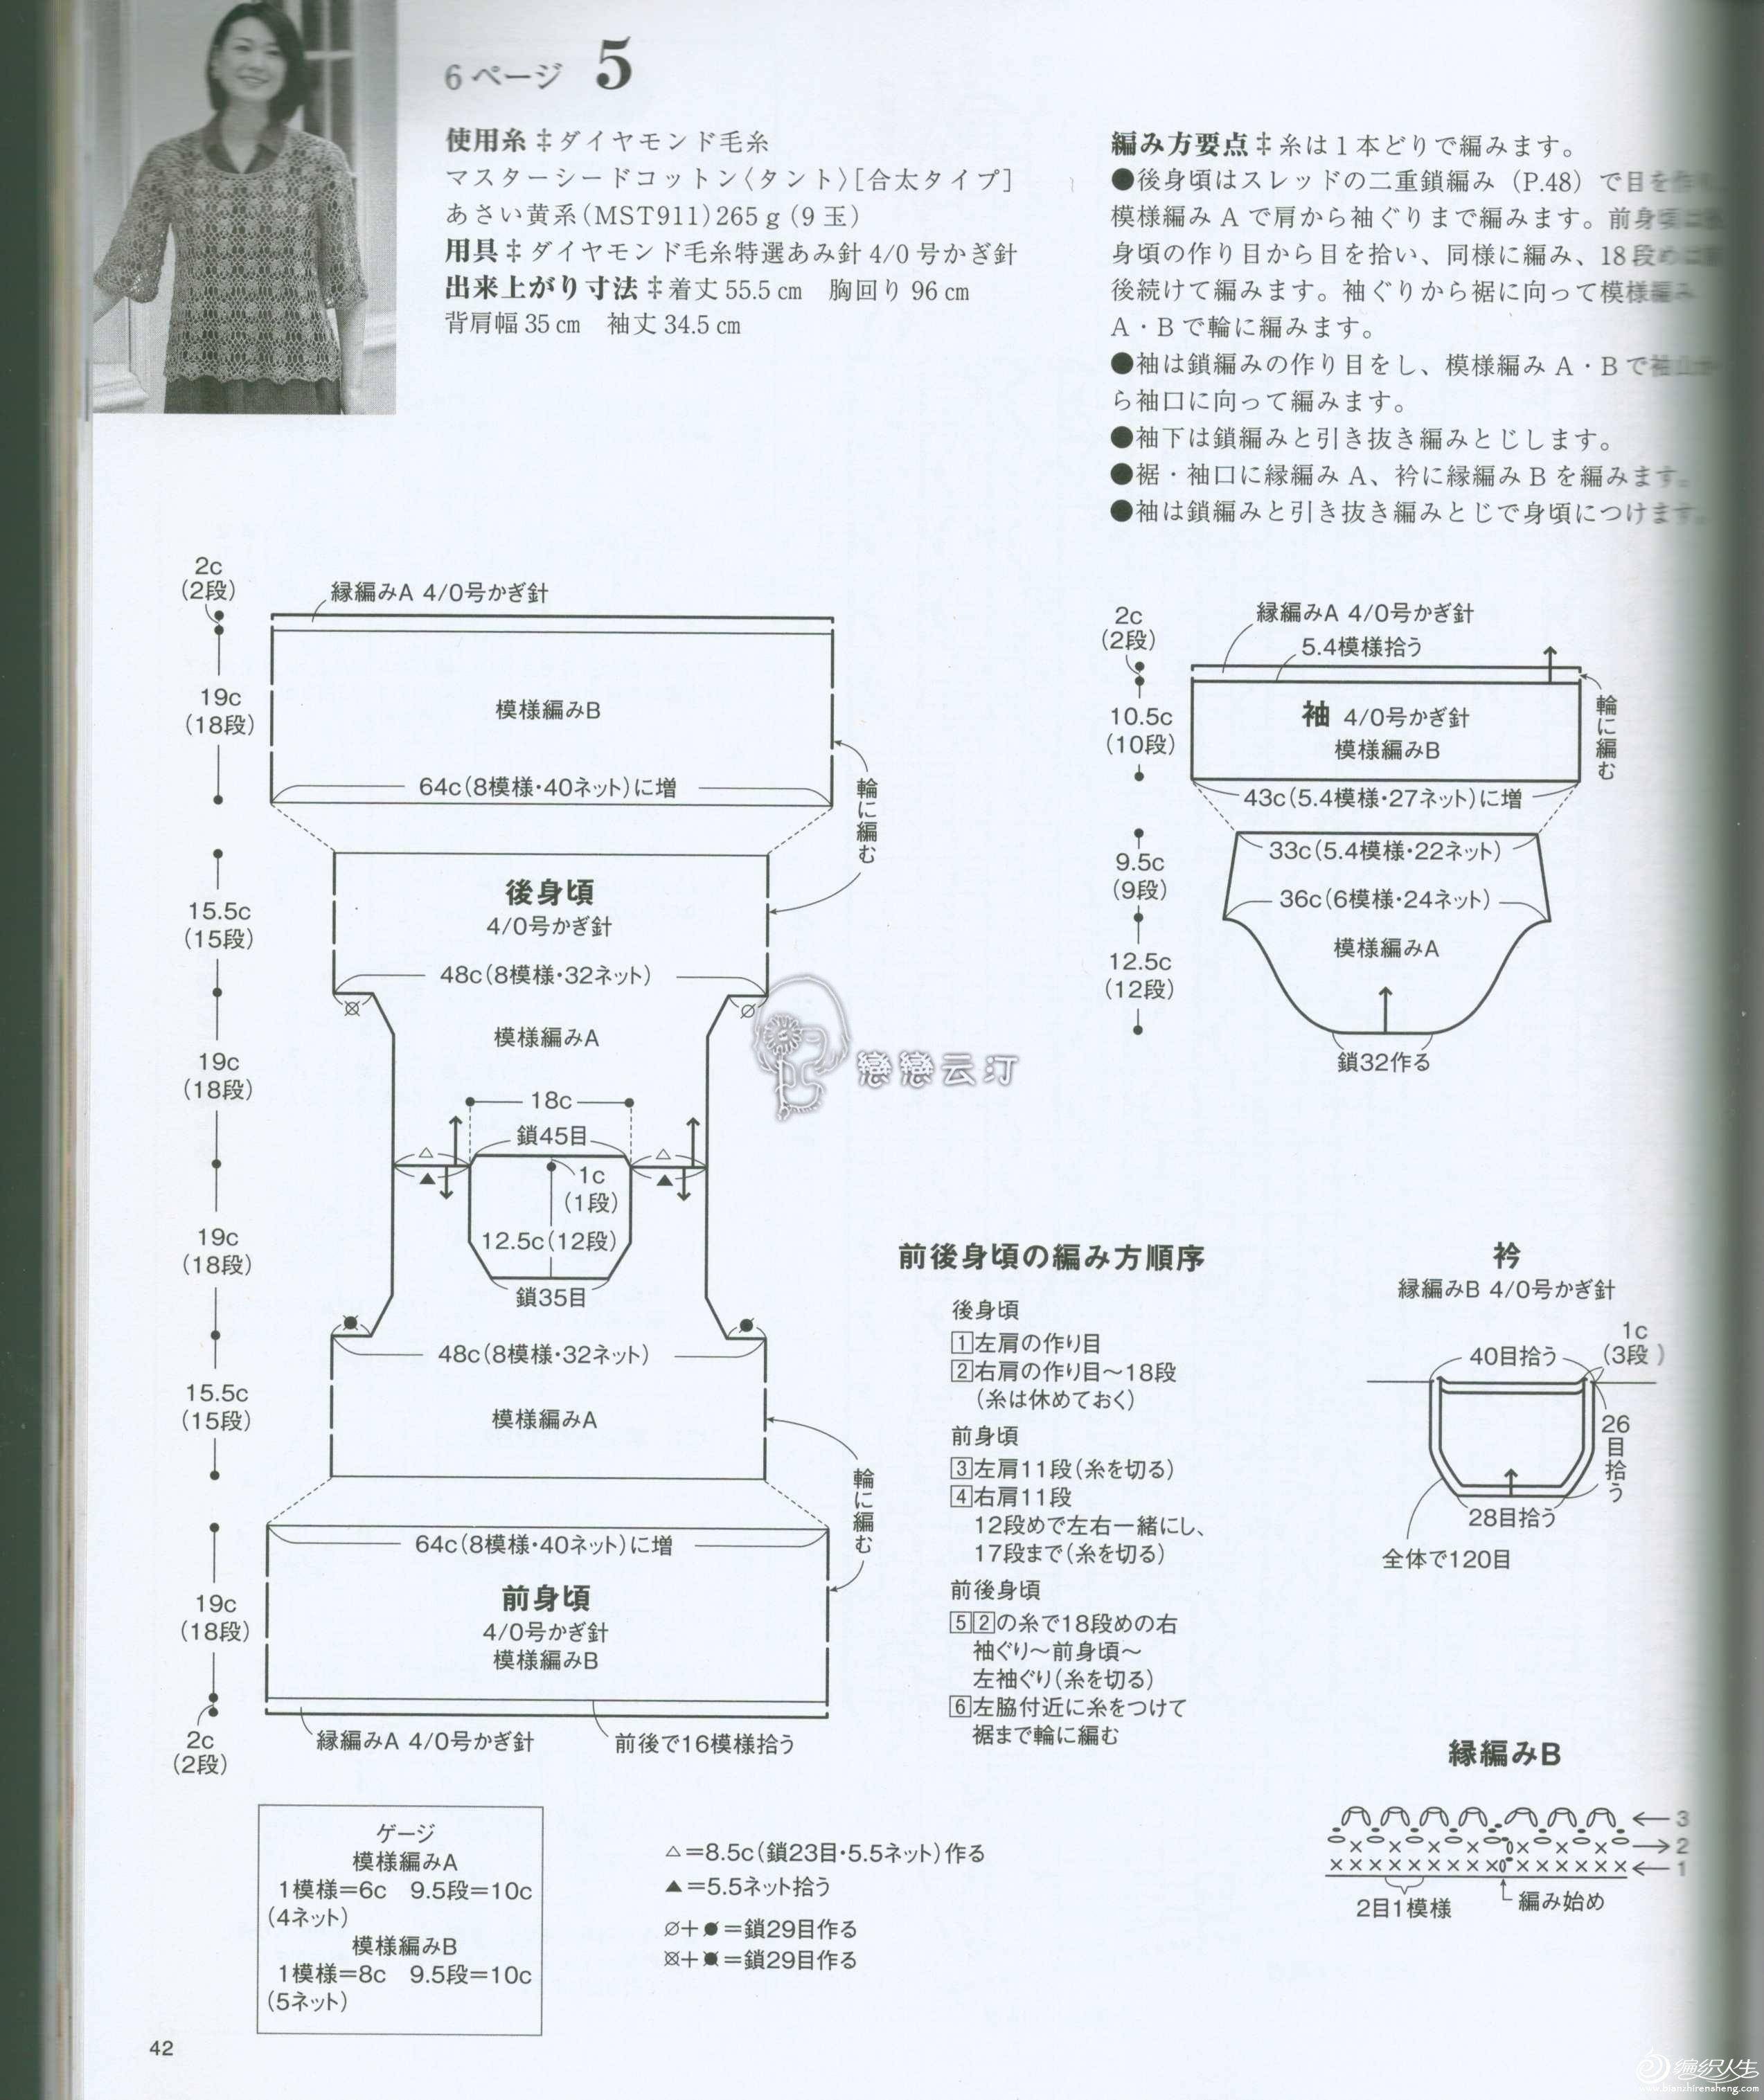 Image_00042.jpg